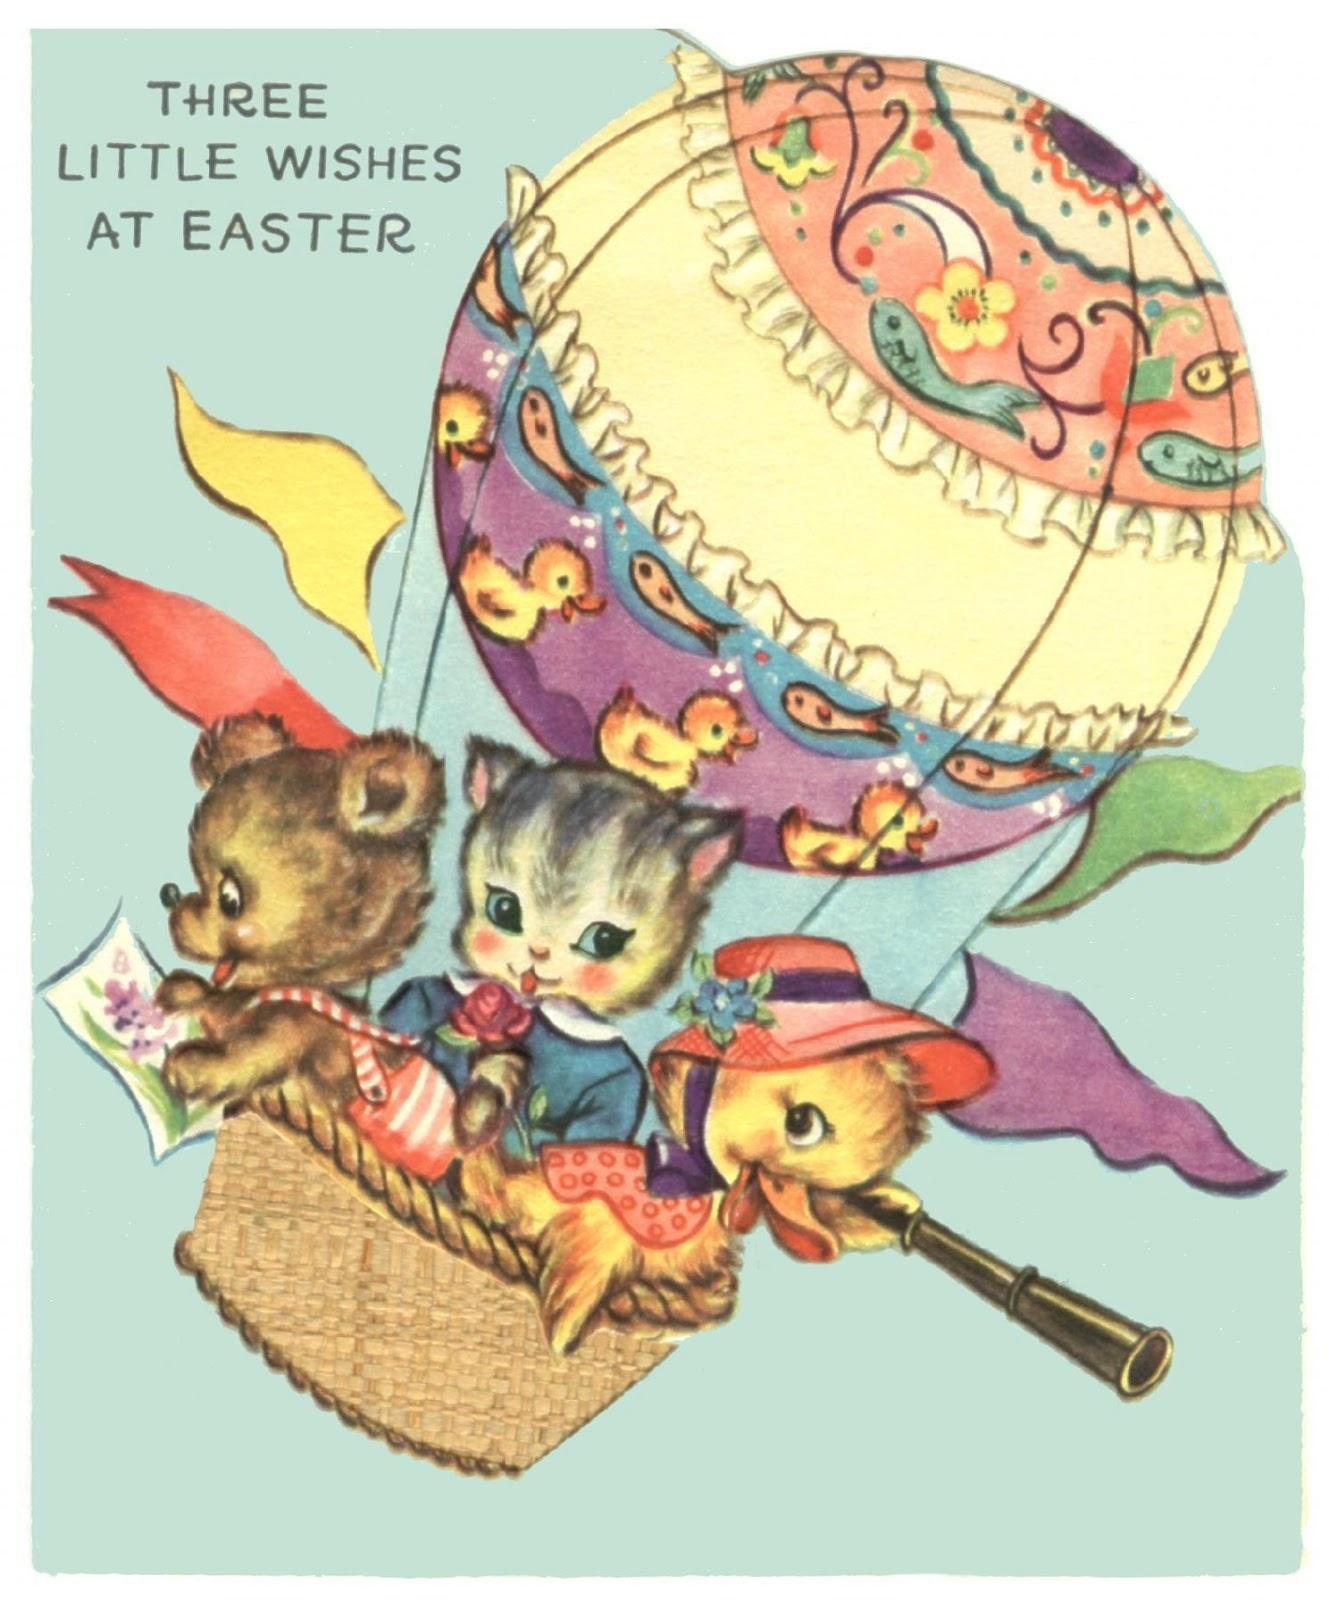 Sweet B. Revival Event Floral Design Wichita, Kansas: Free Printable - Free Printable Vintage Easter Images